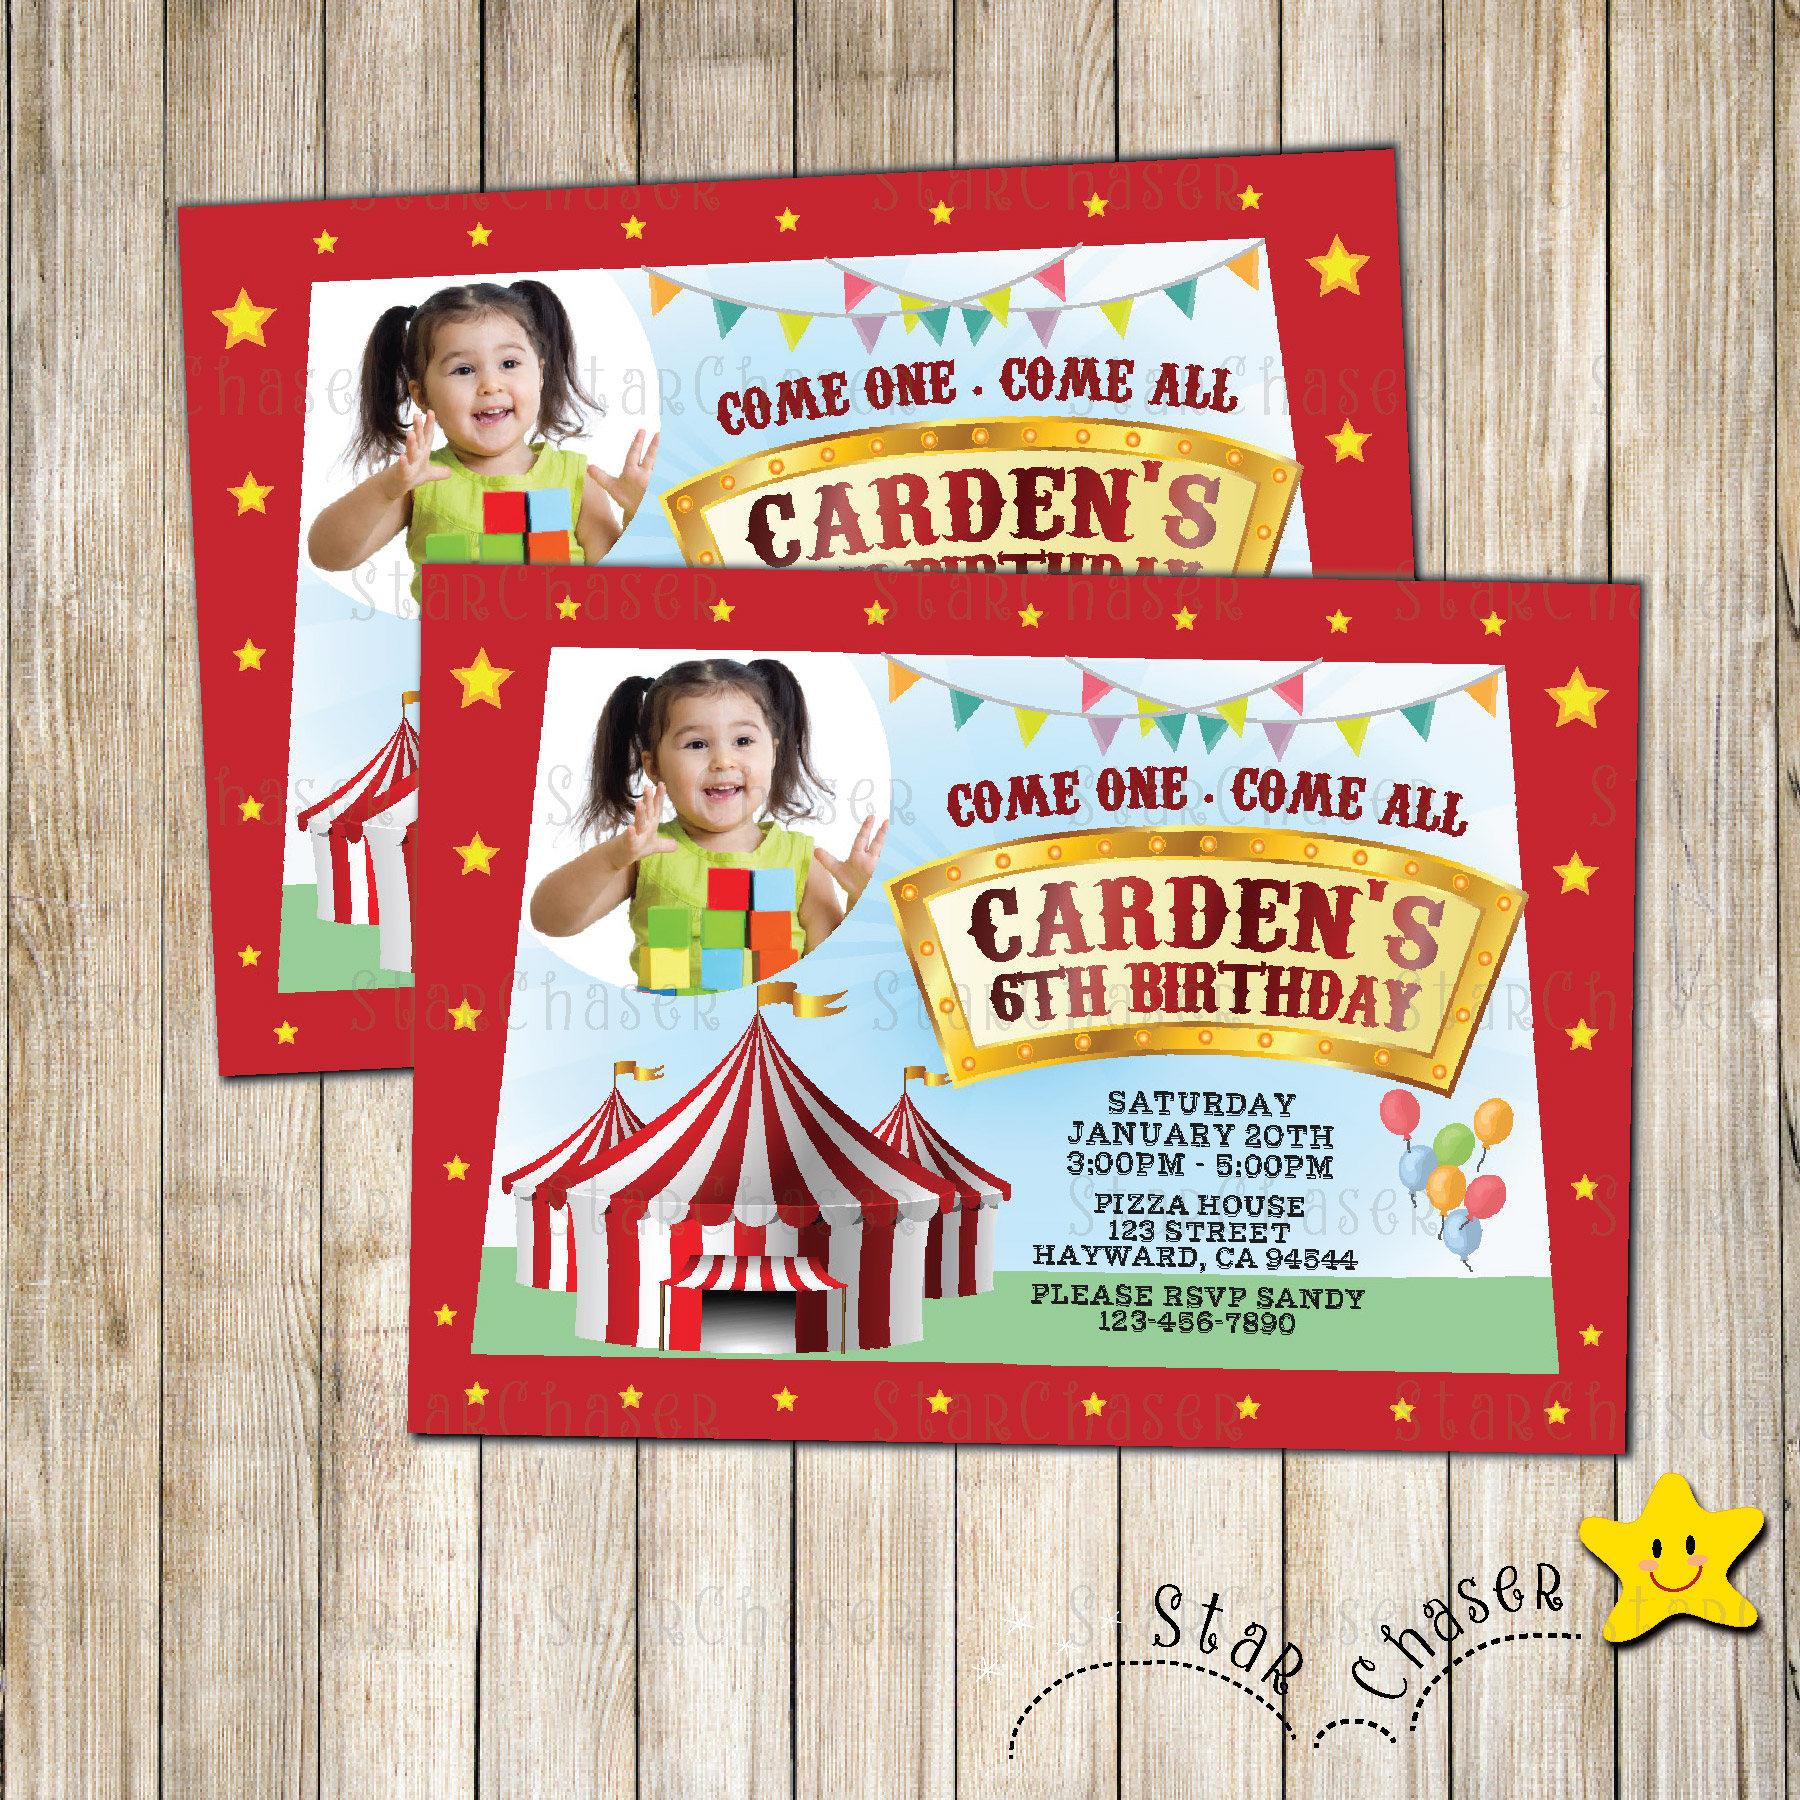 Digital Carnival birthday invitation. Circus birthday